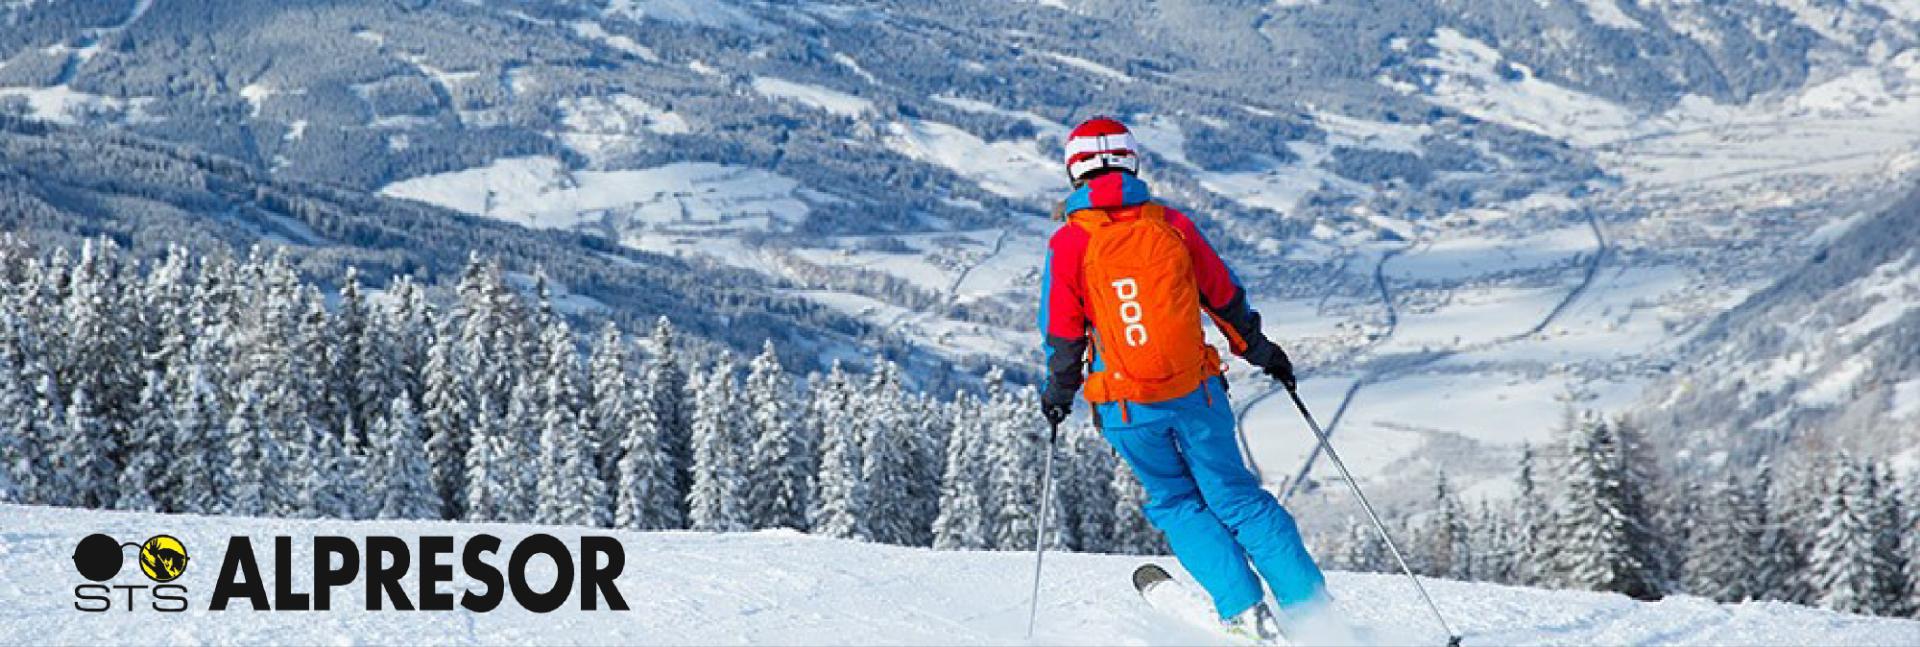 rabatt skidresor.com